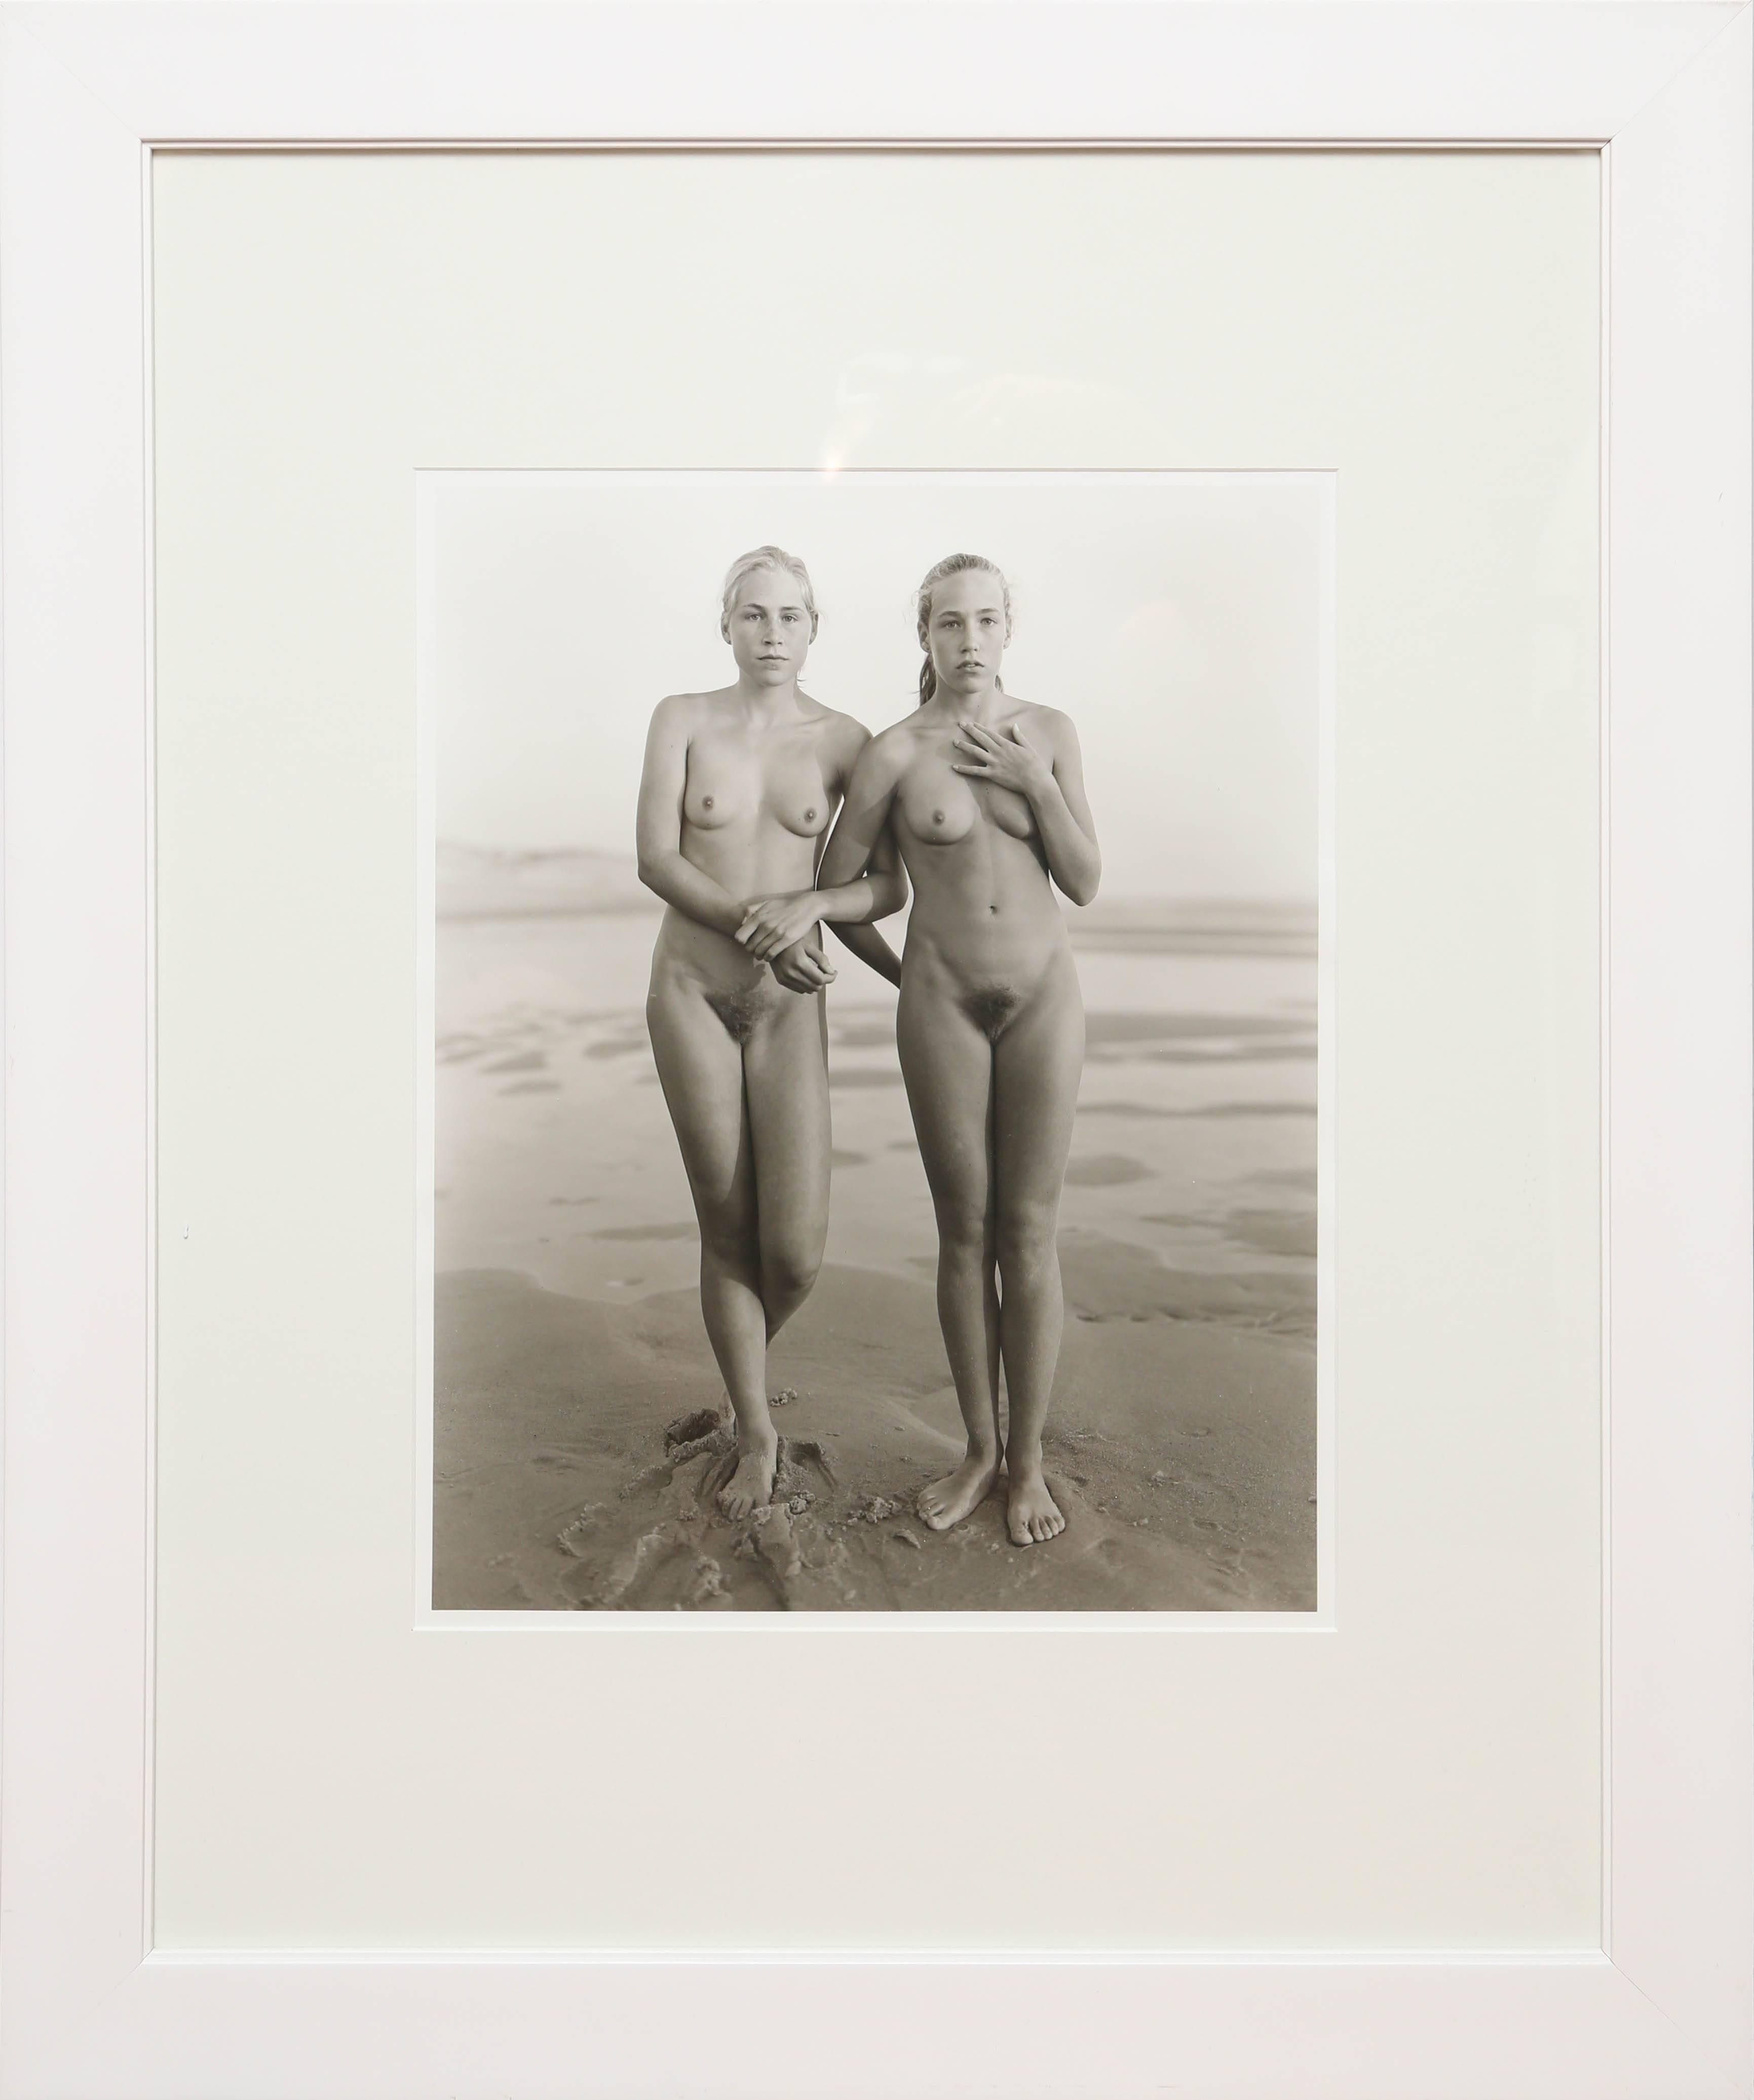 oxygen-facial-uncensored-nude-sturges